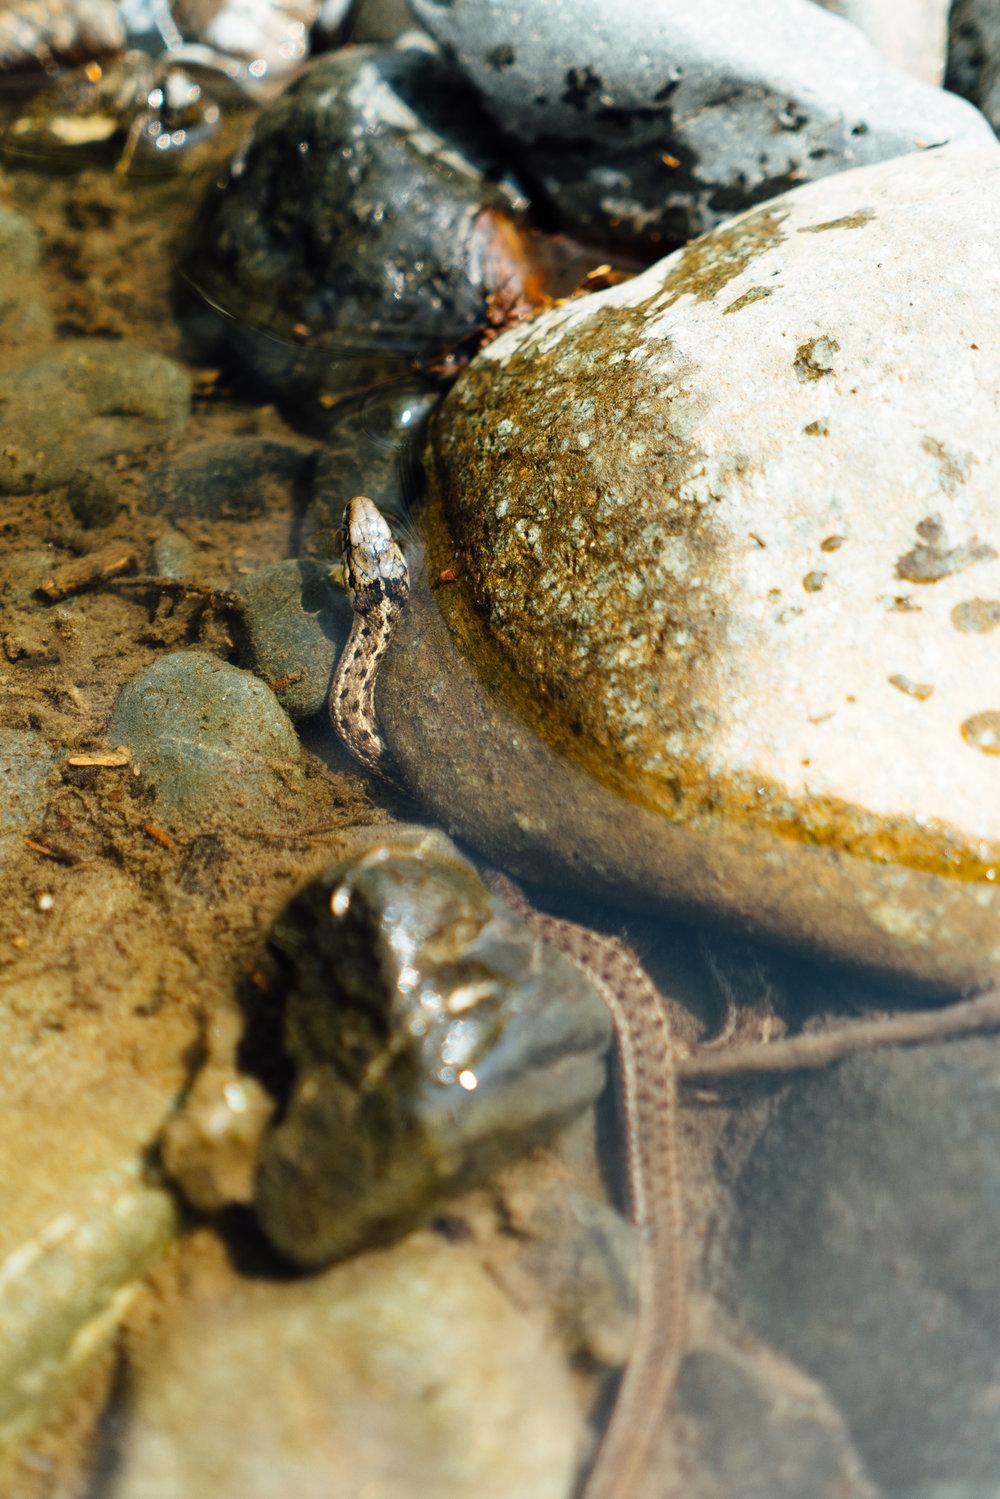 Stock Photograph of a Garter Snake Underwater